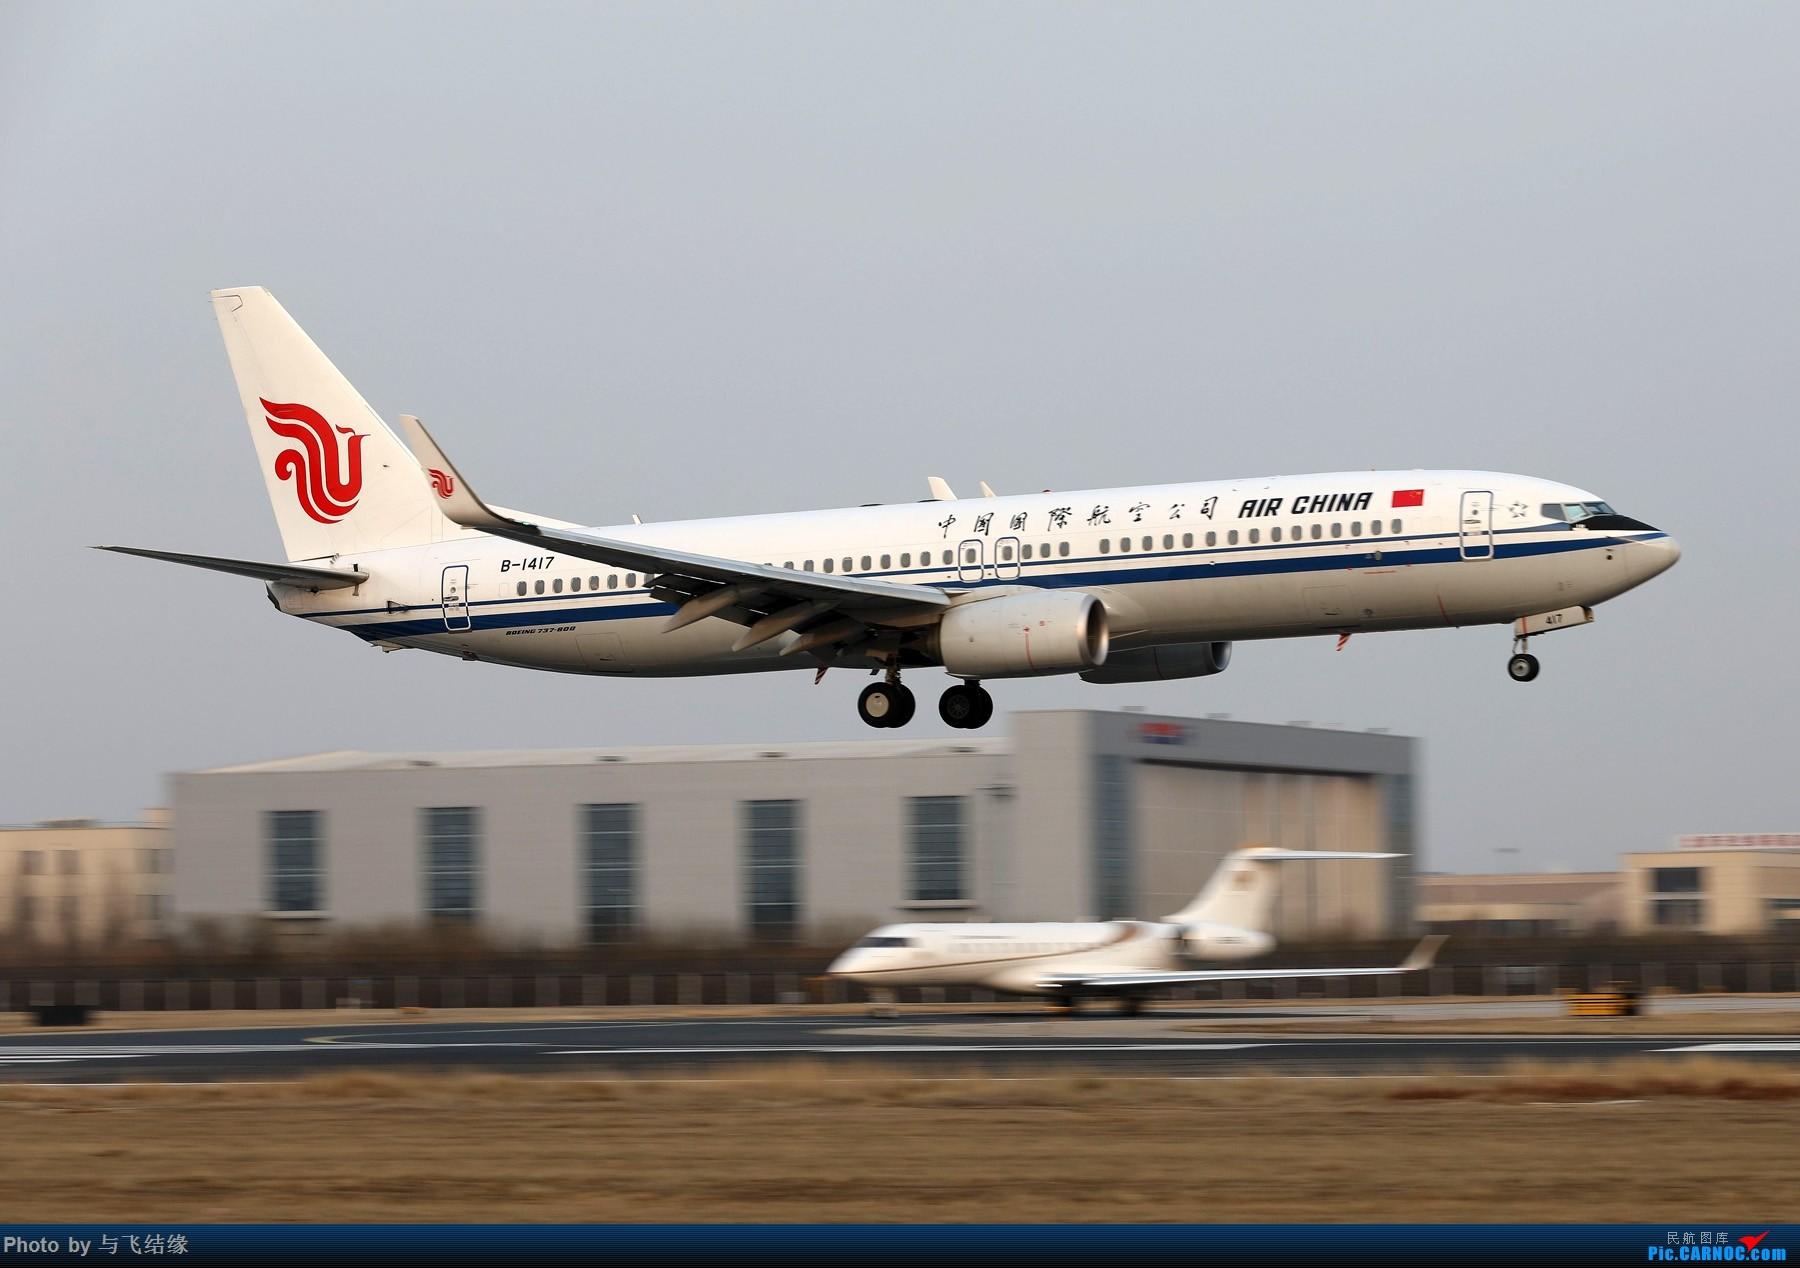 Re:[原创]AA787两图及其他等等 BOEING 737-800 B-1417 中国北京首都国际机场